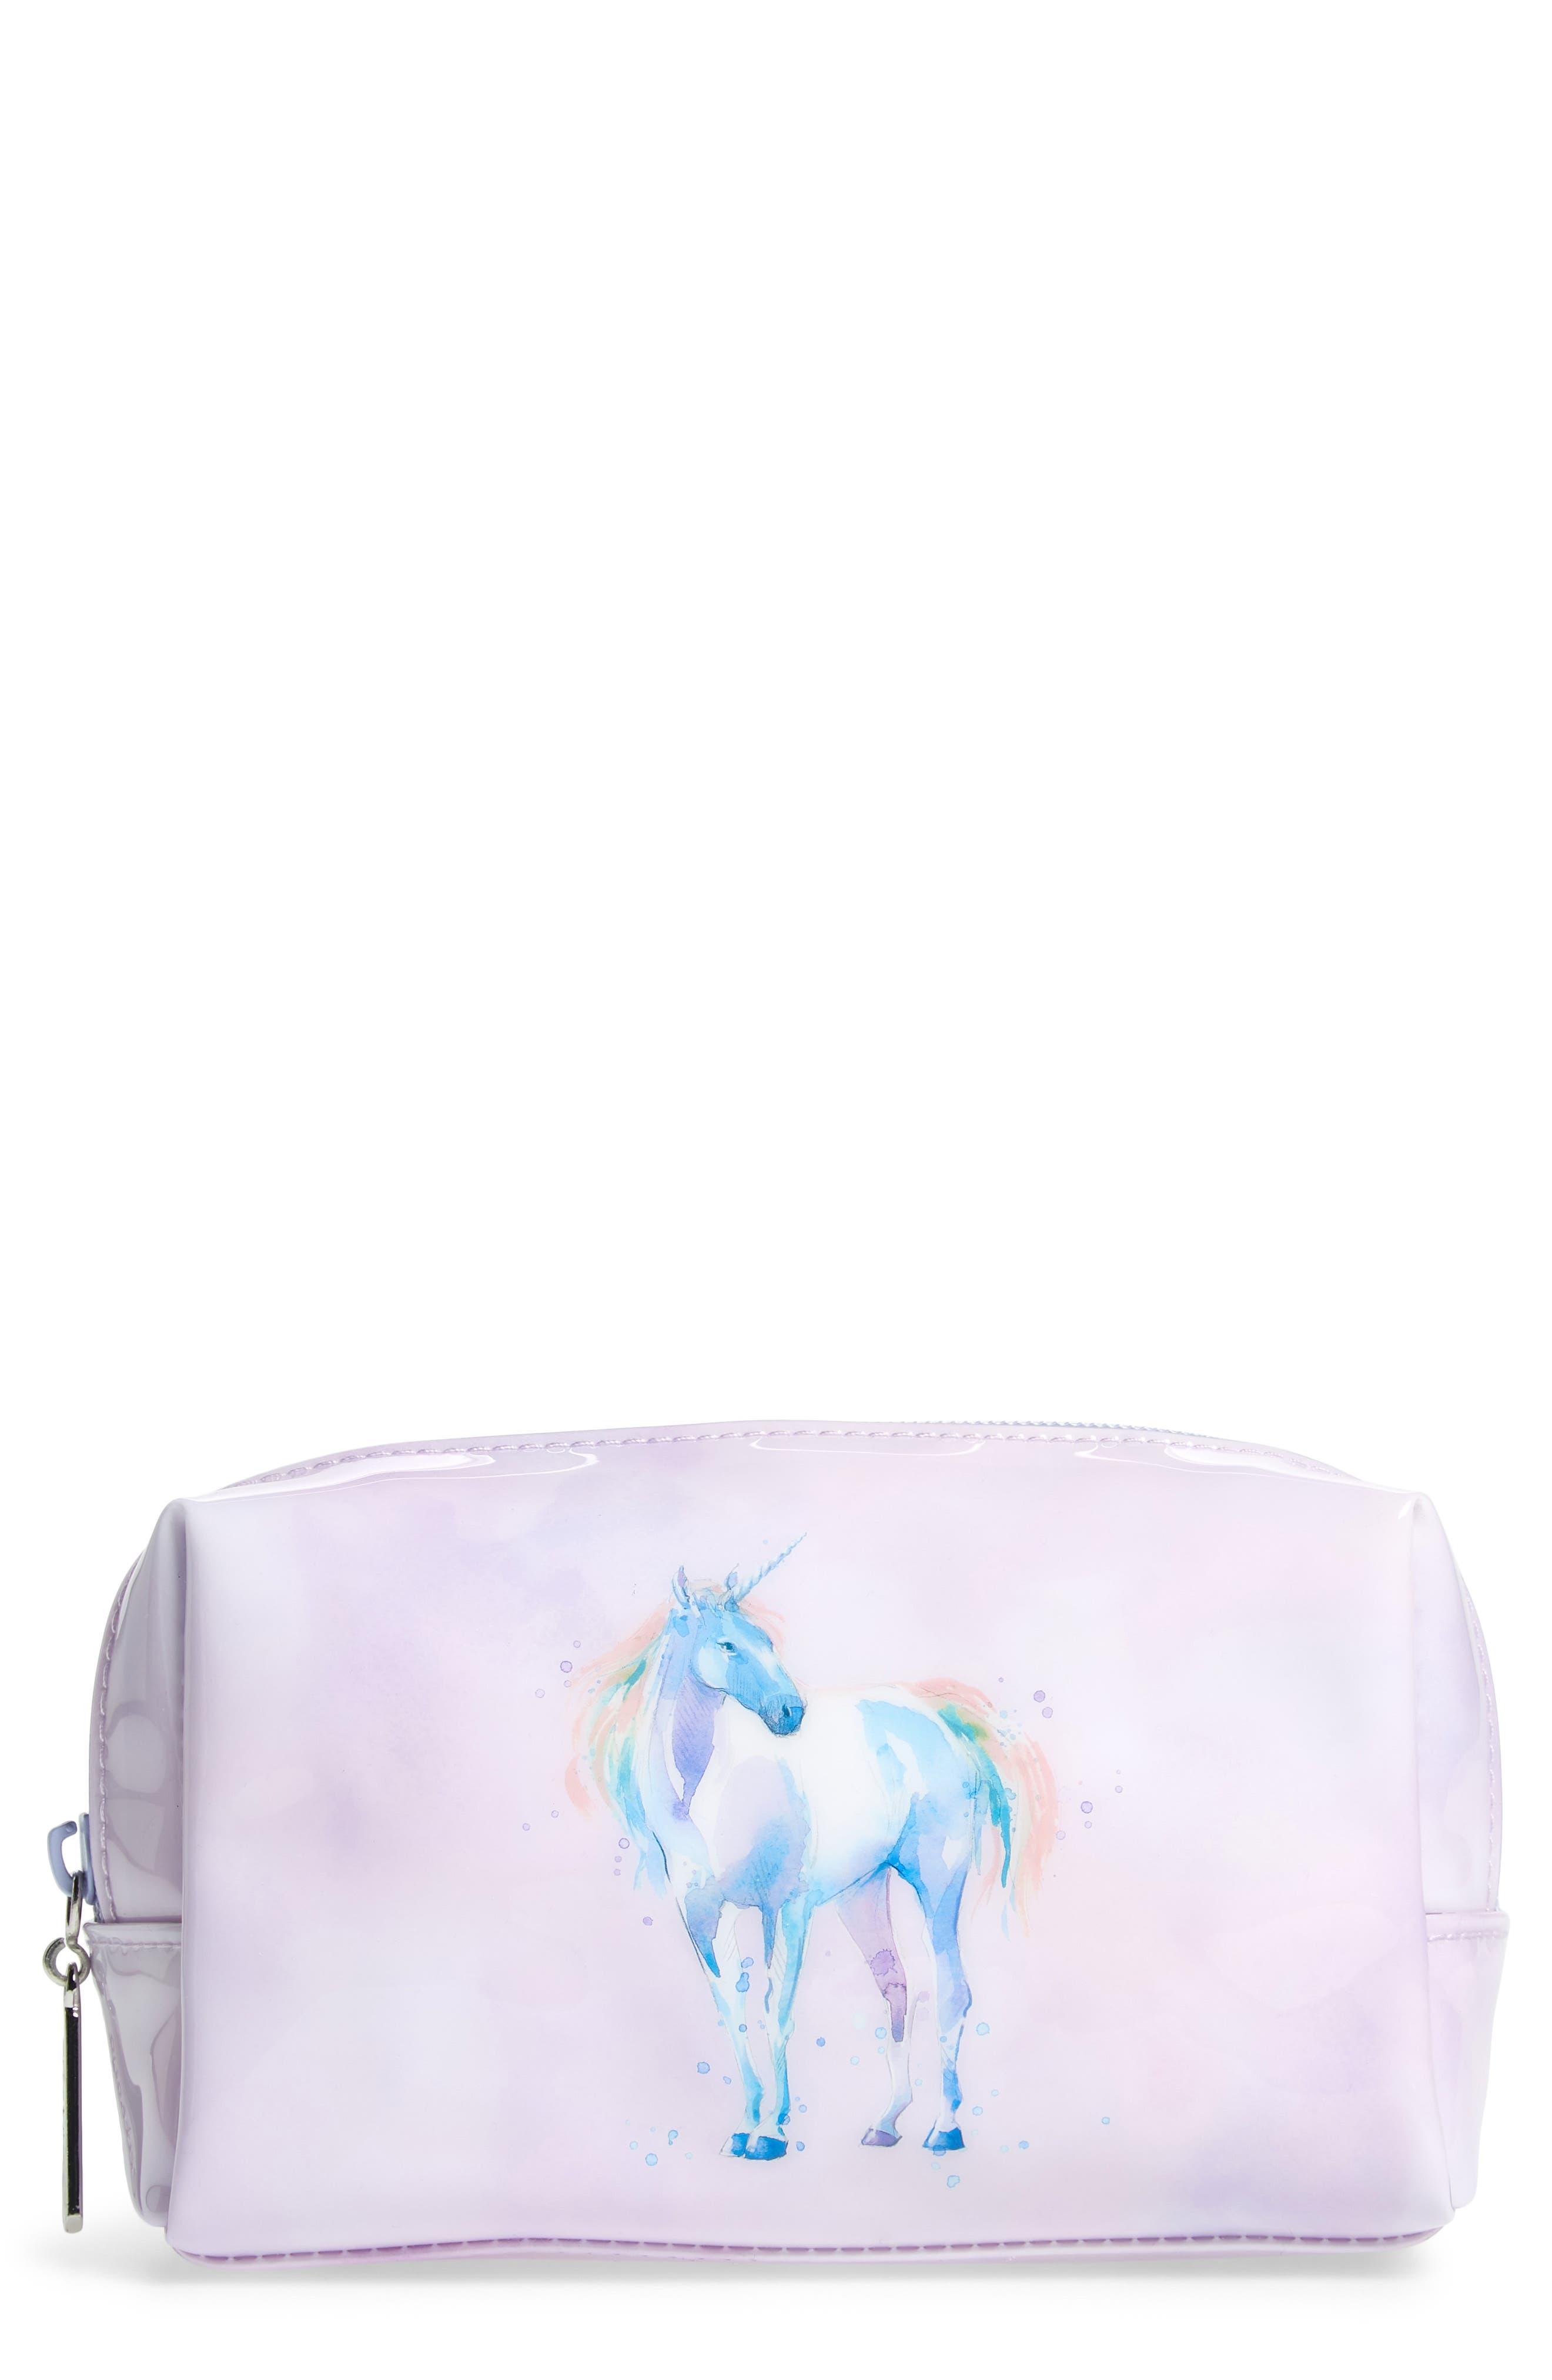 Watercolor Unicorn Cosmetics Case,                             Main thumbnail 1, color,                             530